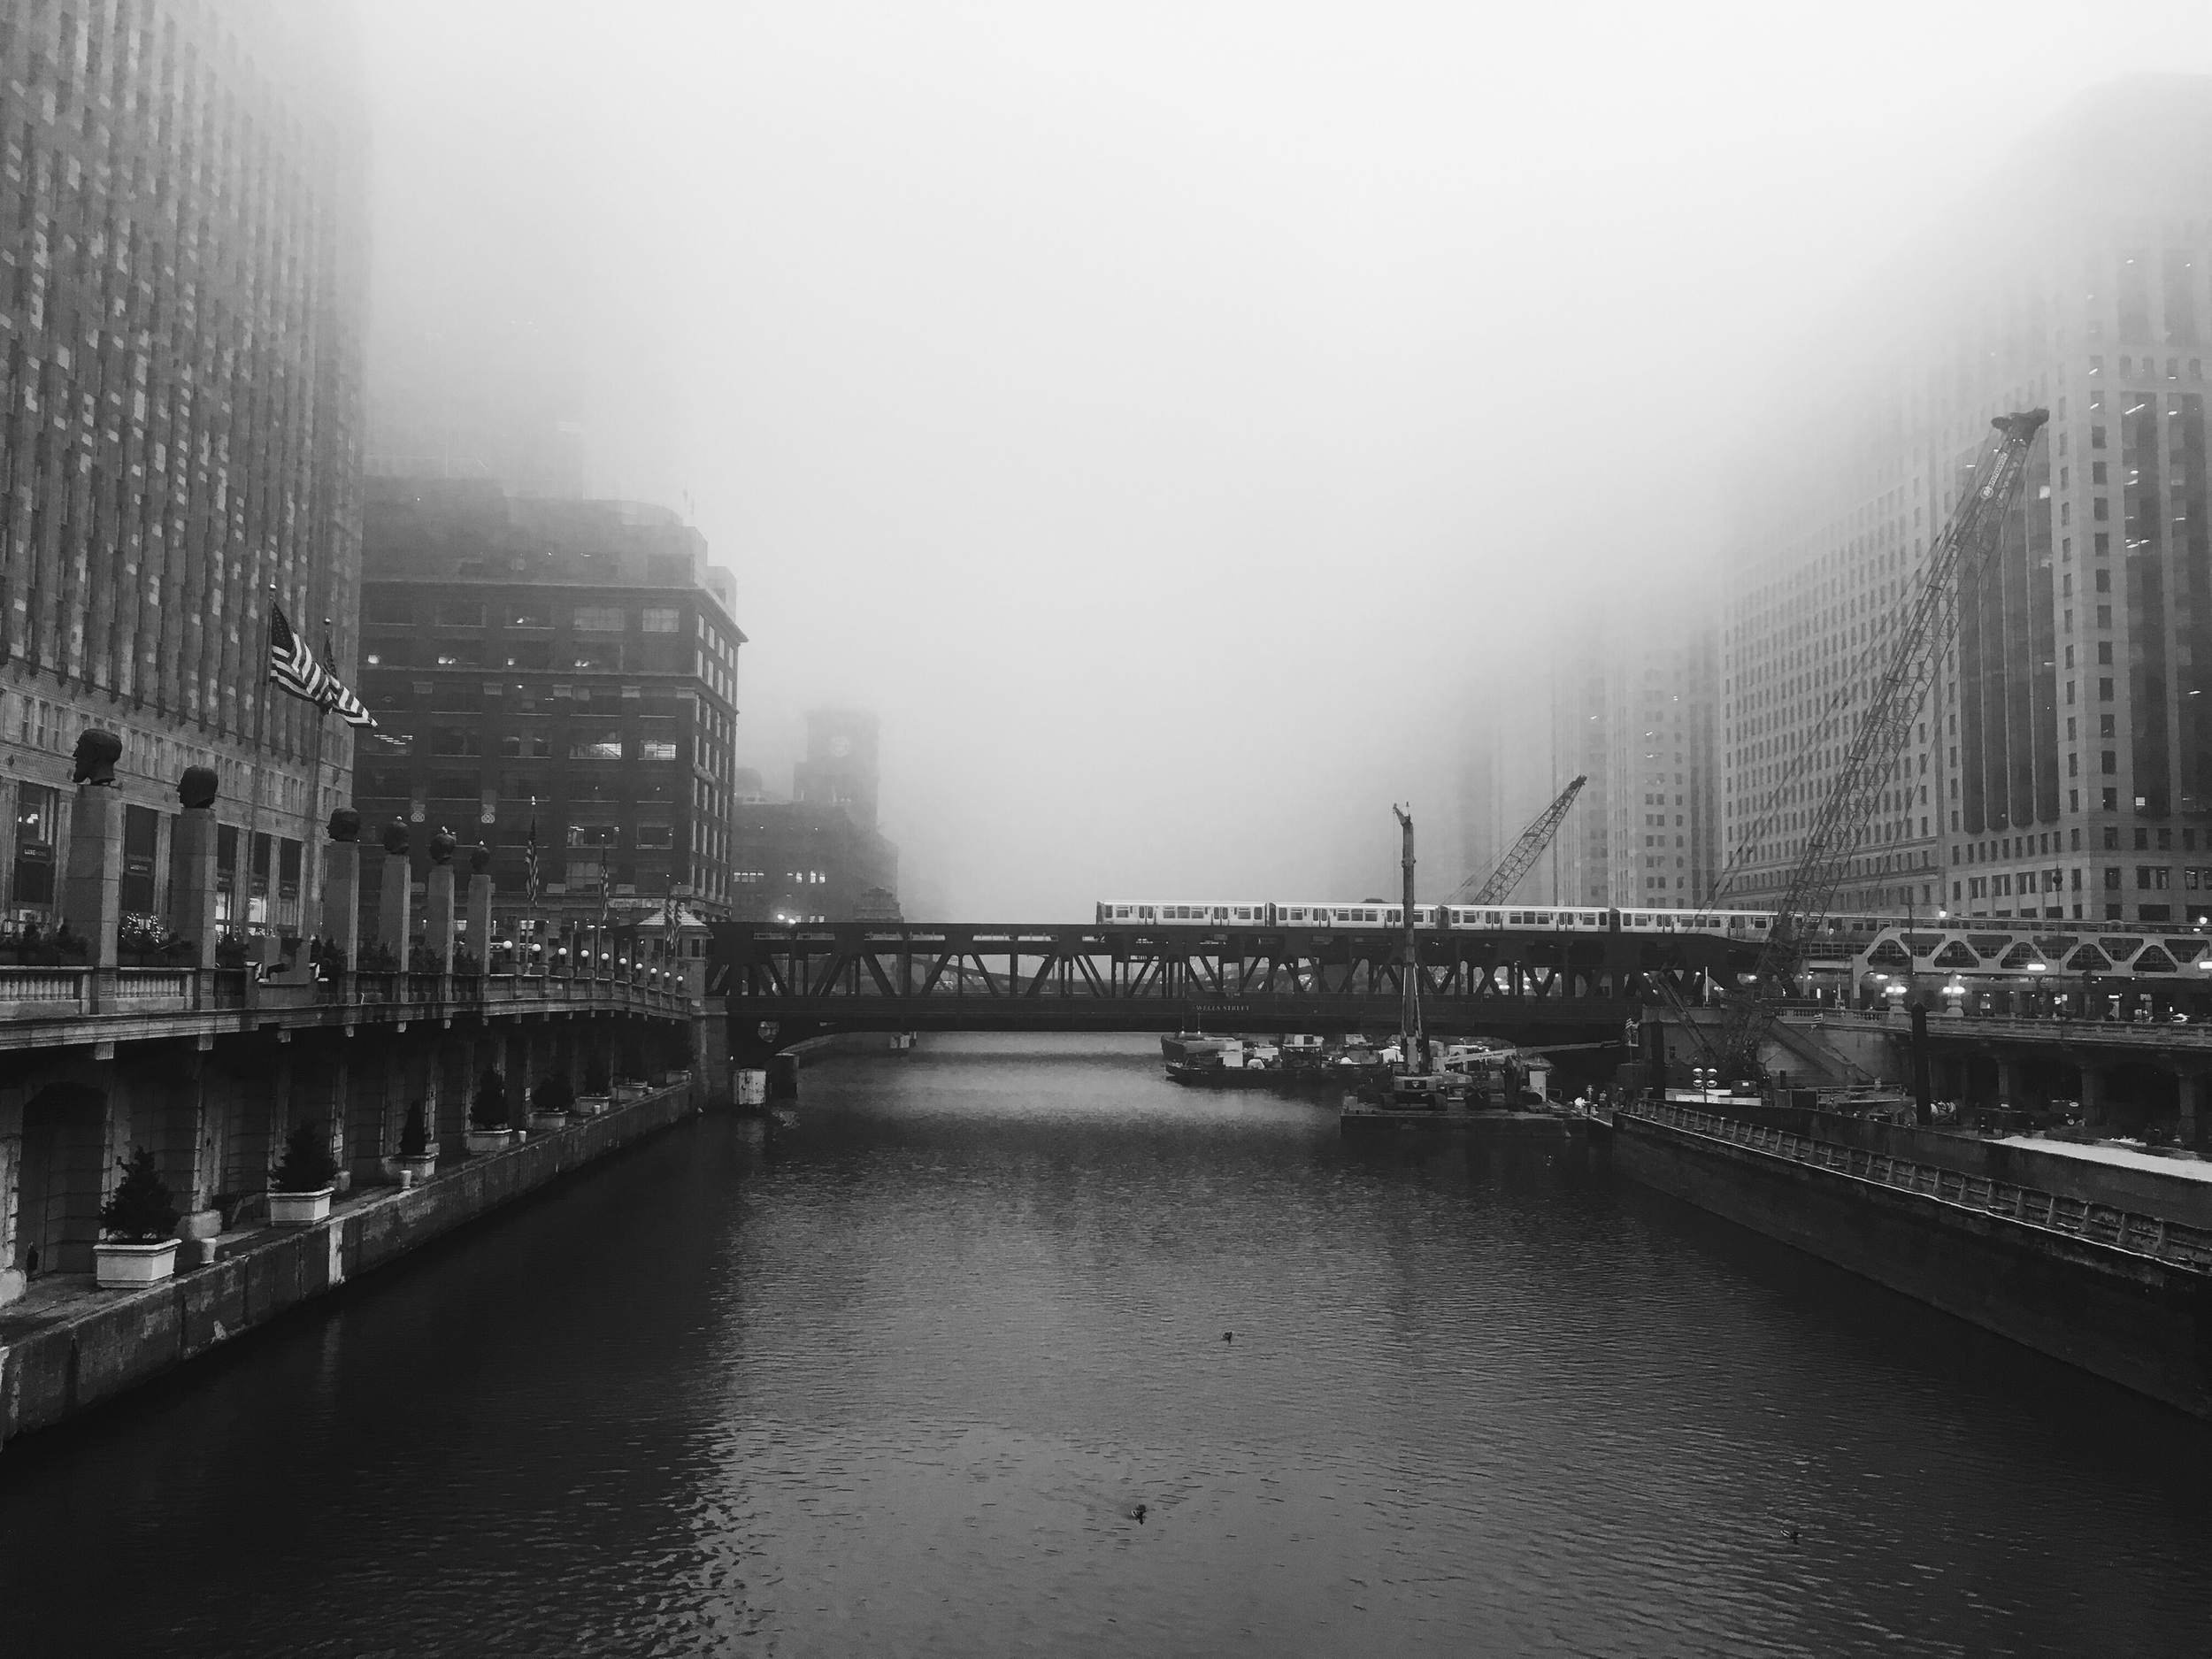 Franklin St bridge